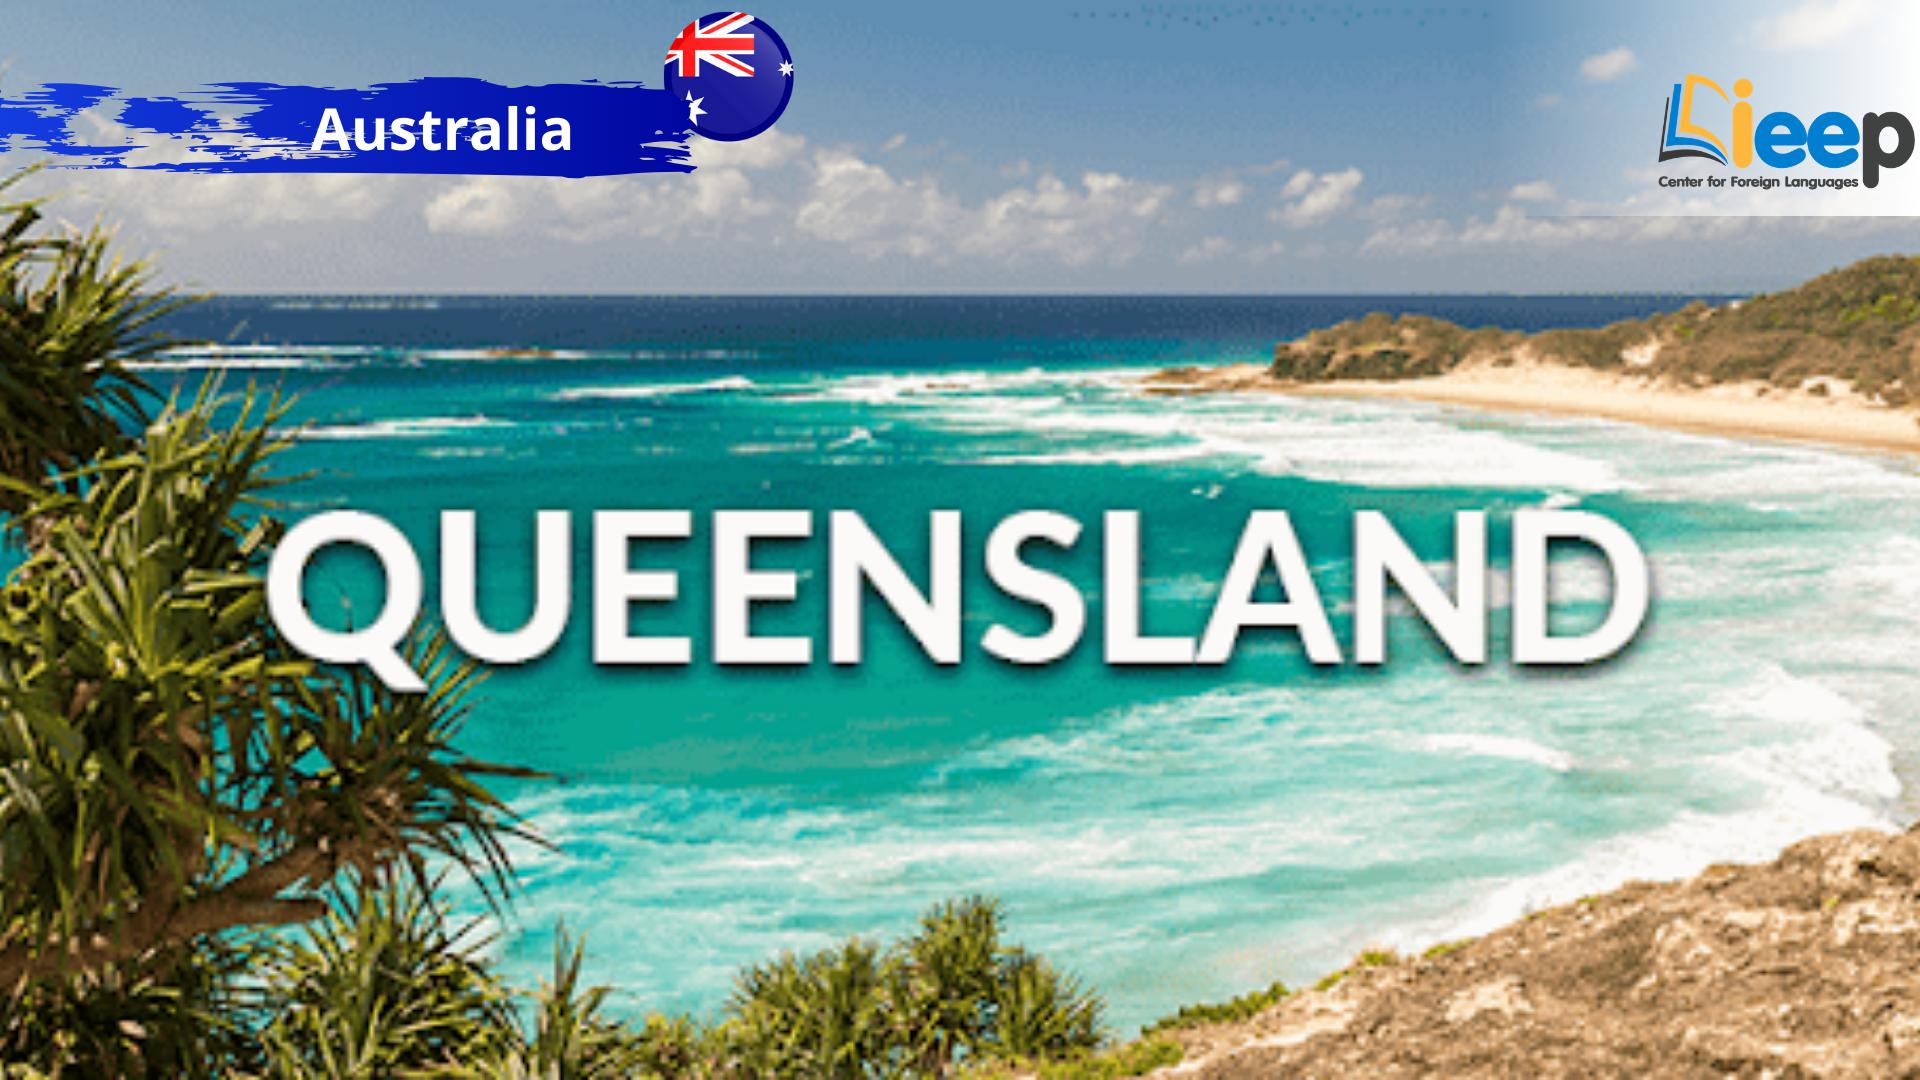 GIỚI THIỆU BANG QUEENSLAND - AUSTRALIA